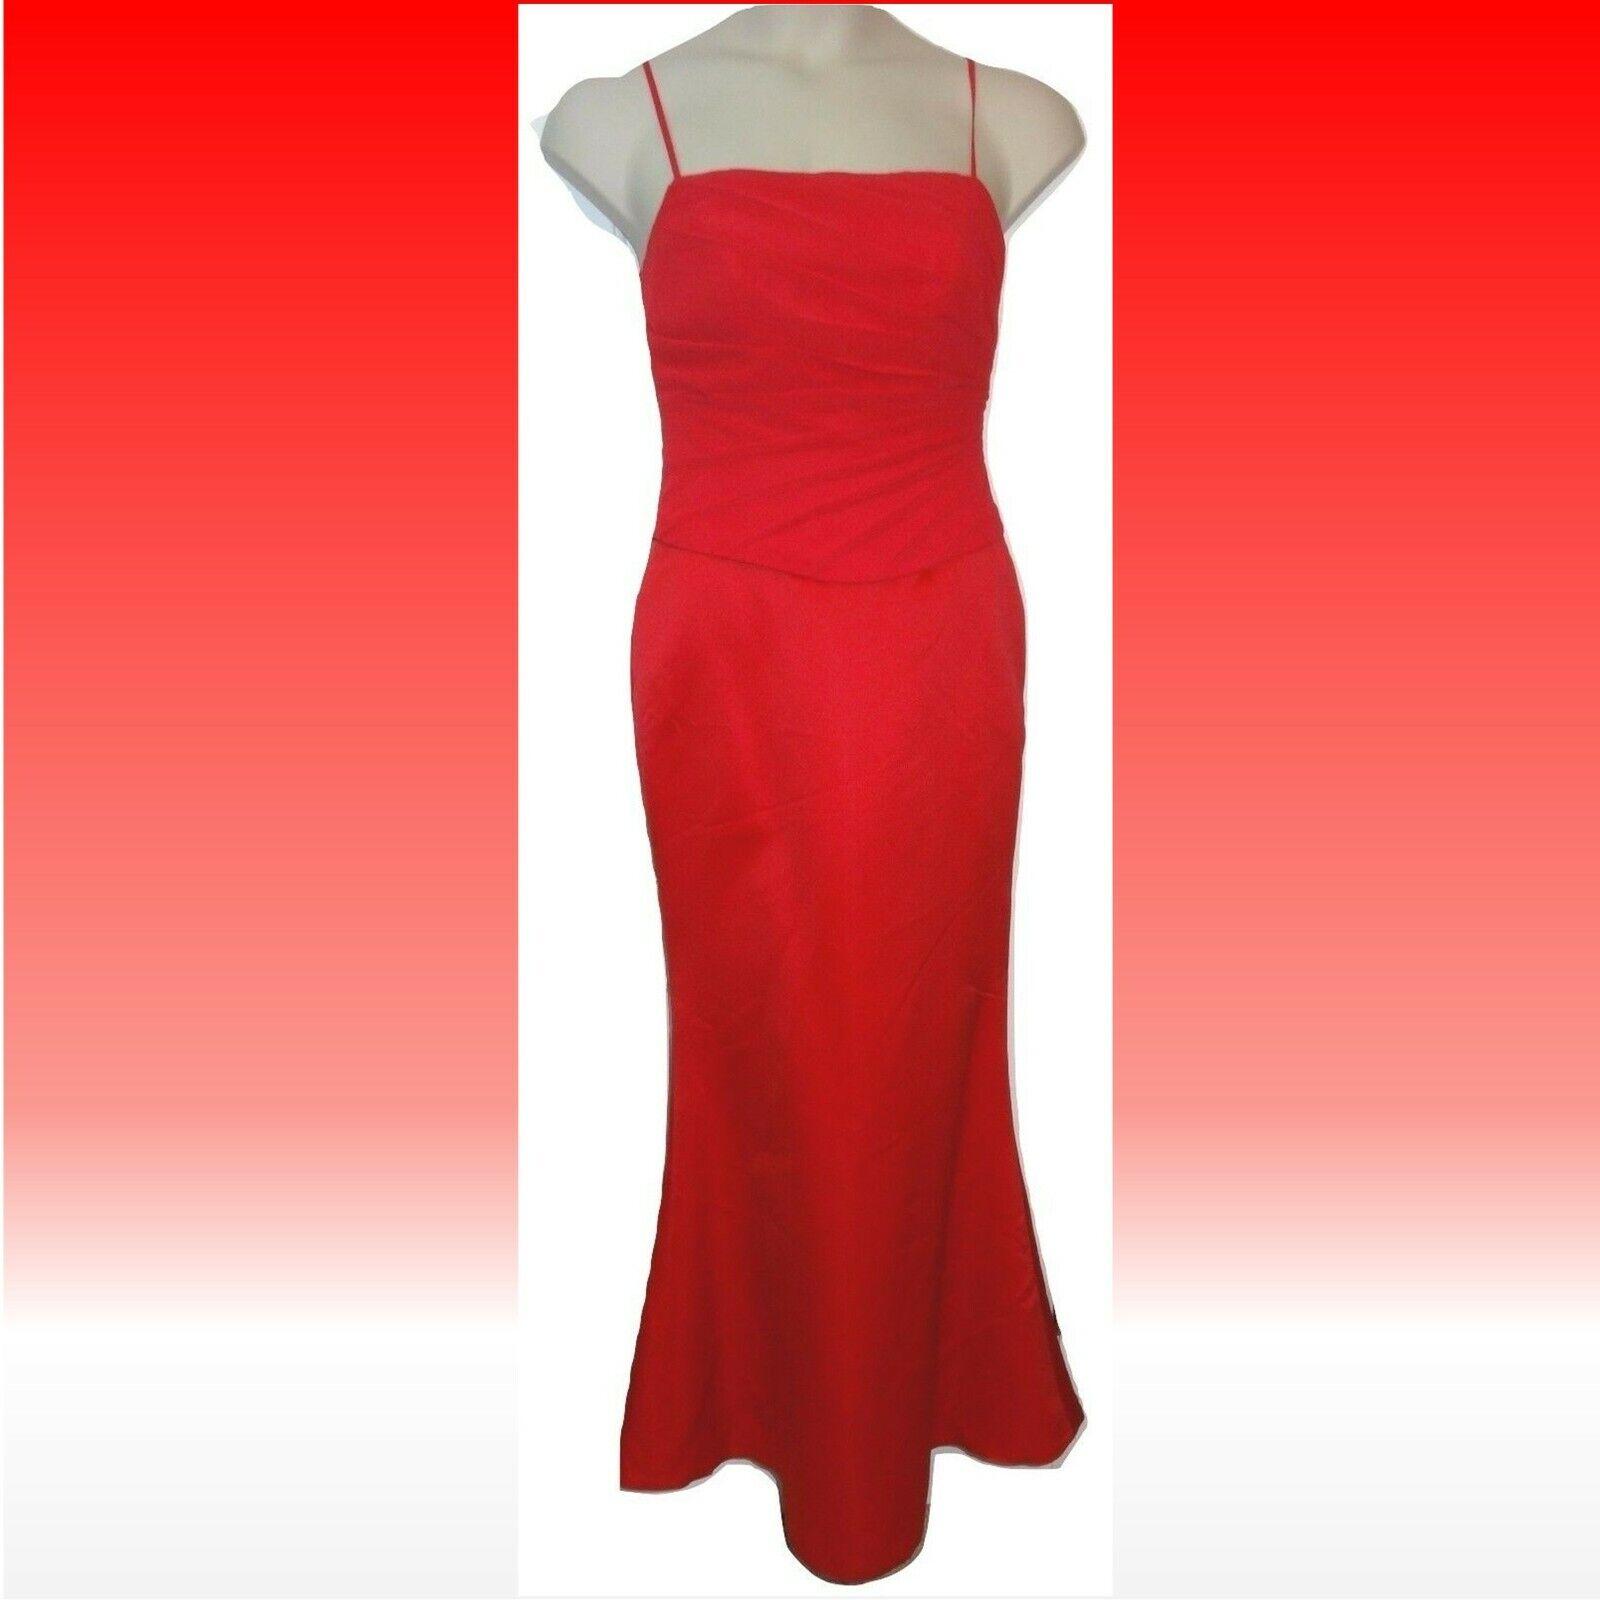 Allure Bridals Bridesmaid Dress Long Formal Red Watermelon Strapless Sz 10 NWT